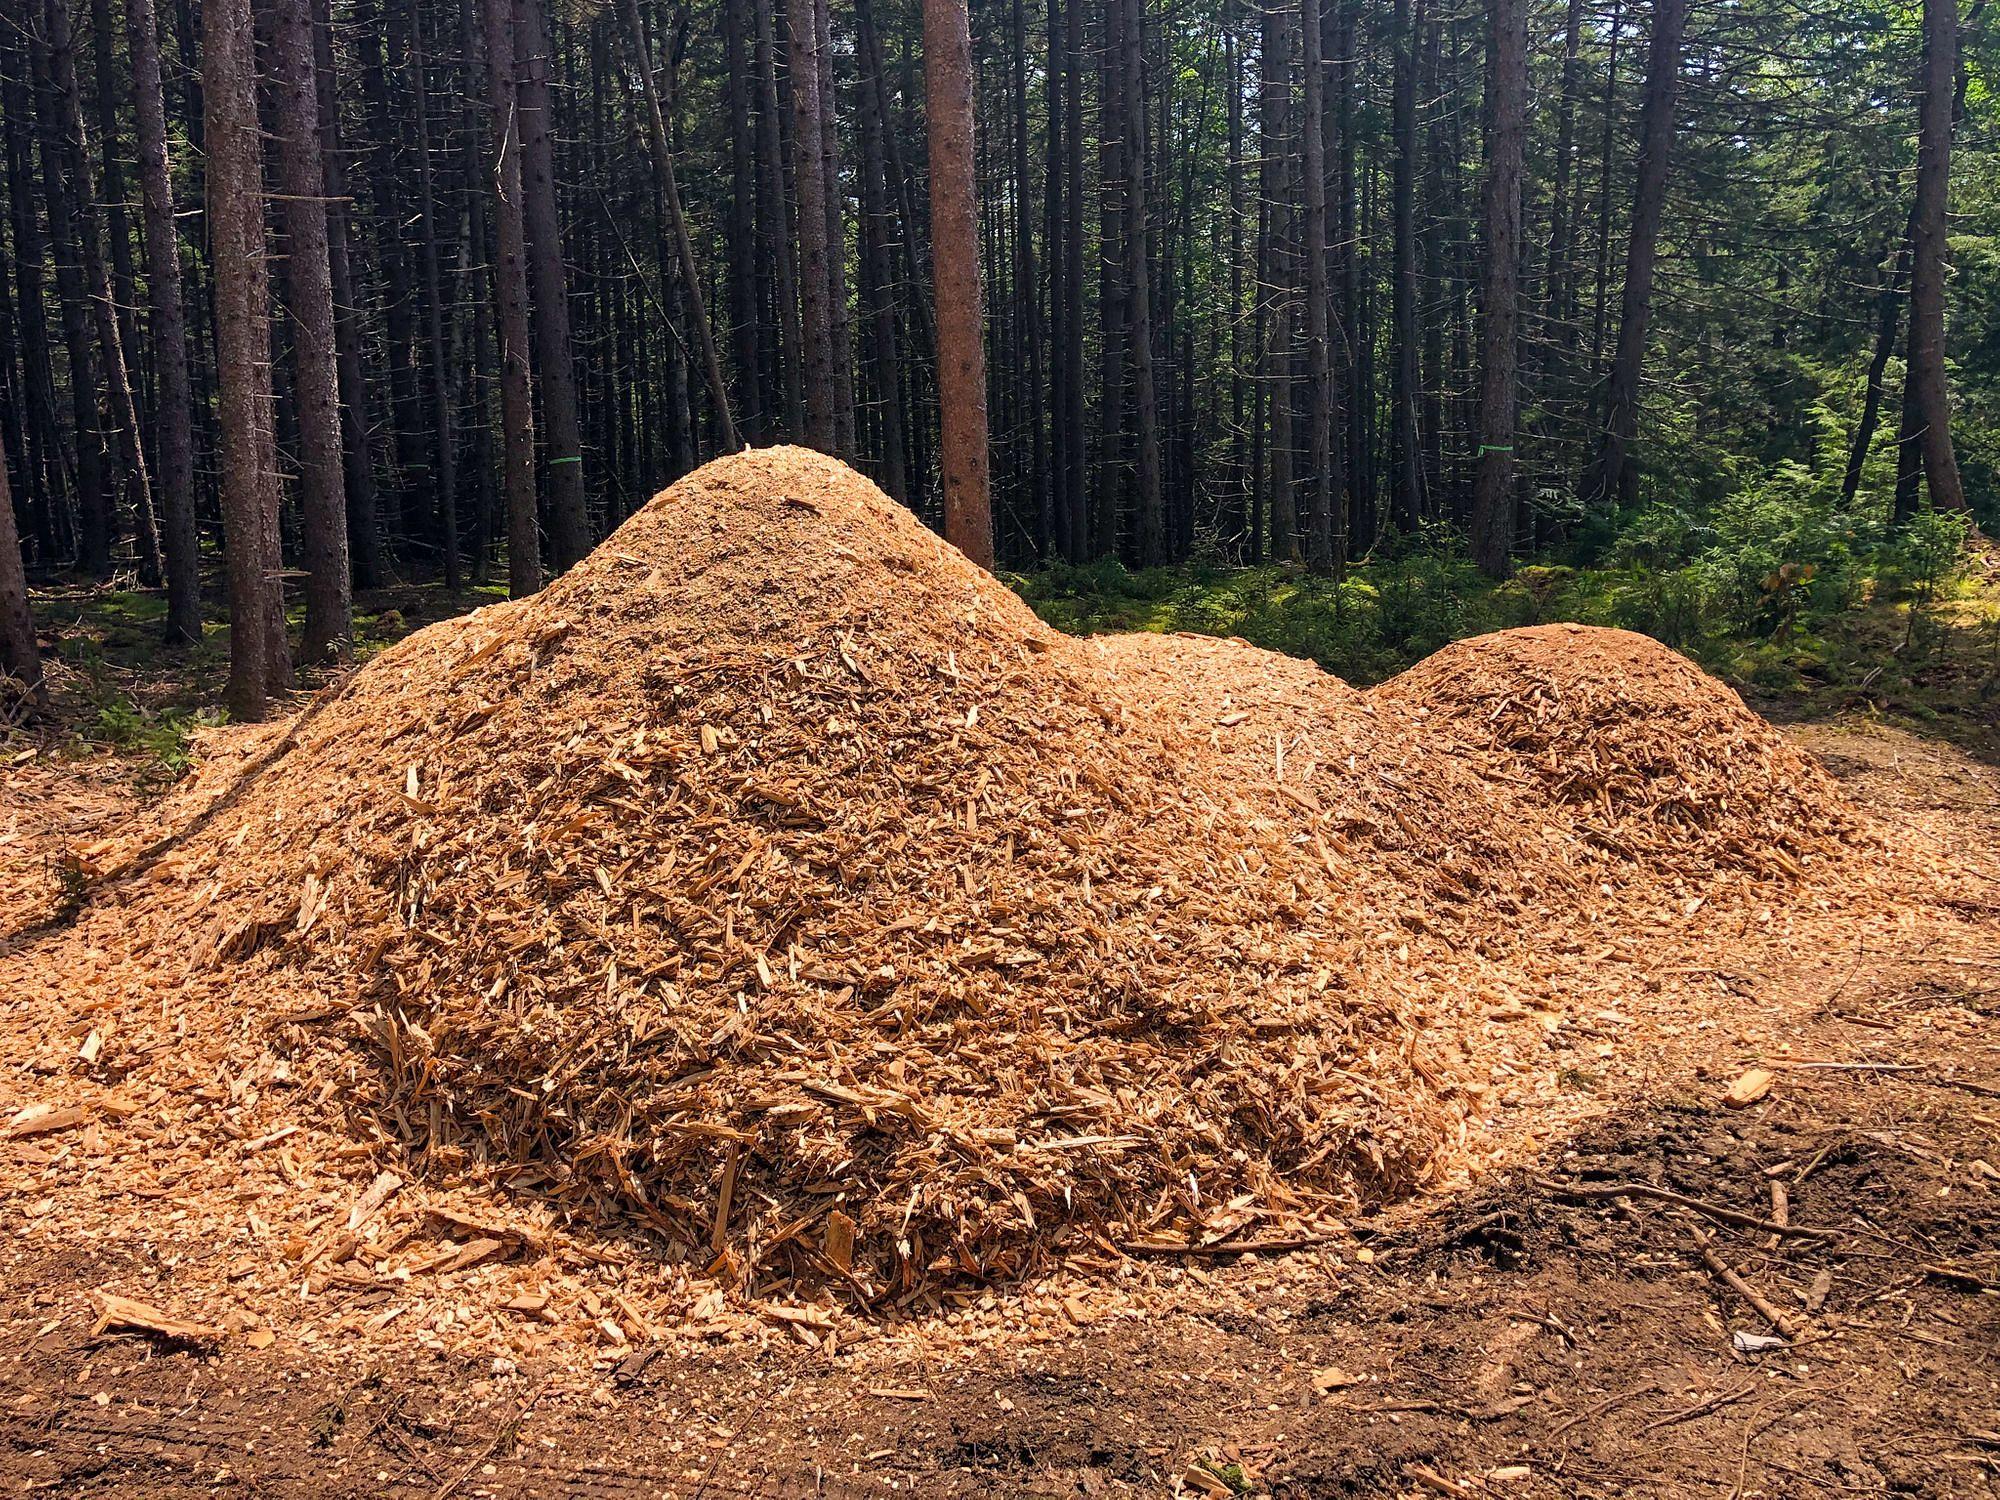 Wood Chip Piles